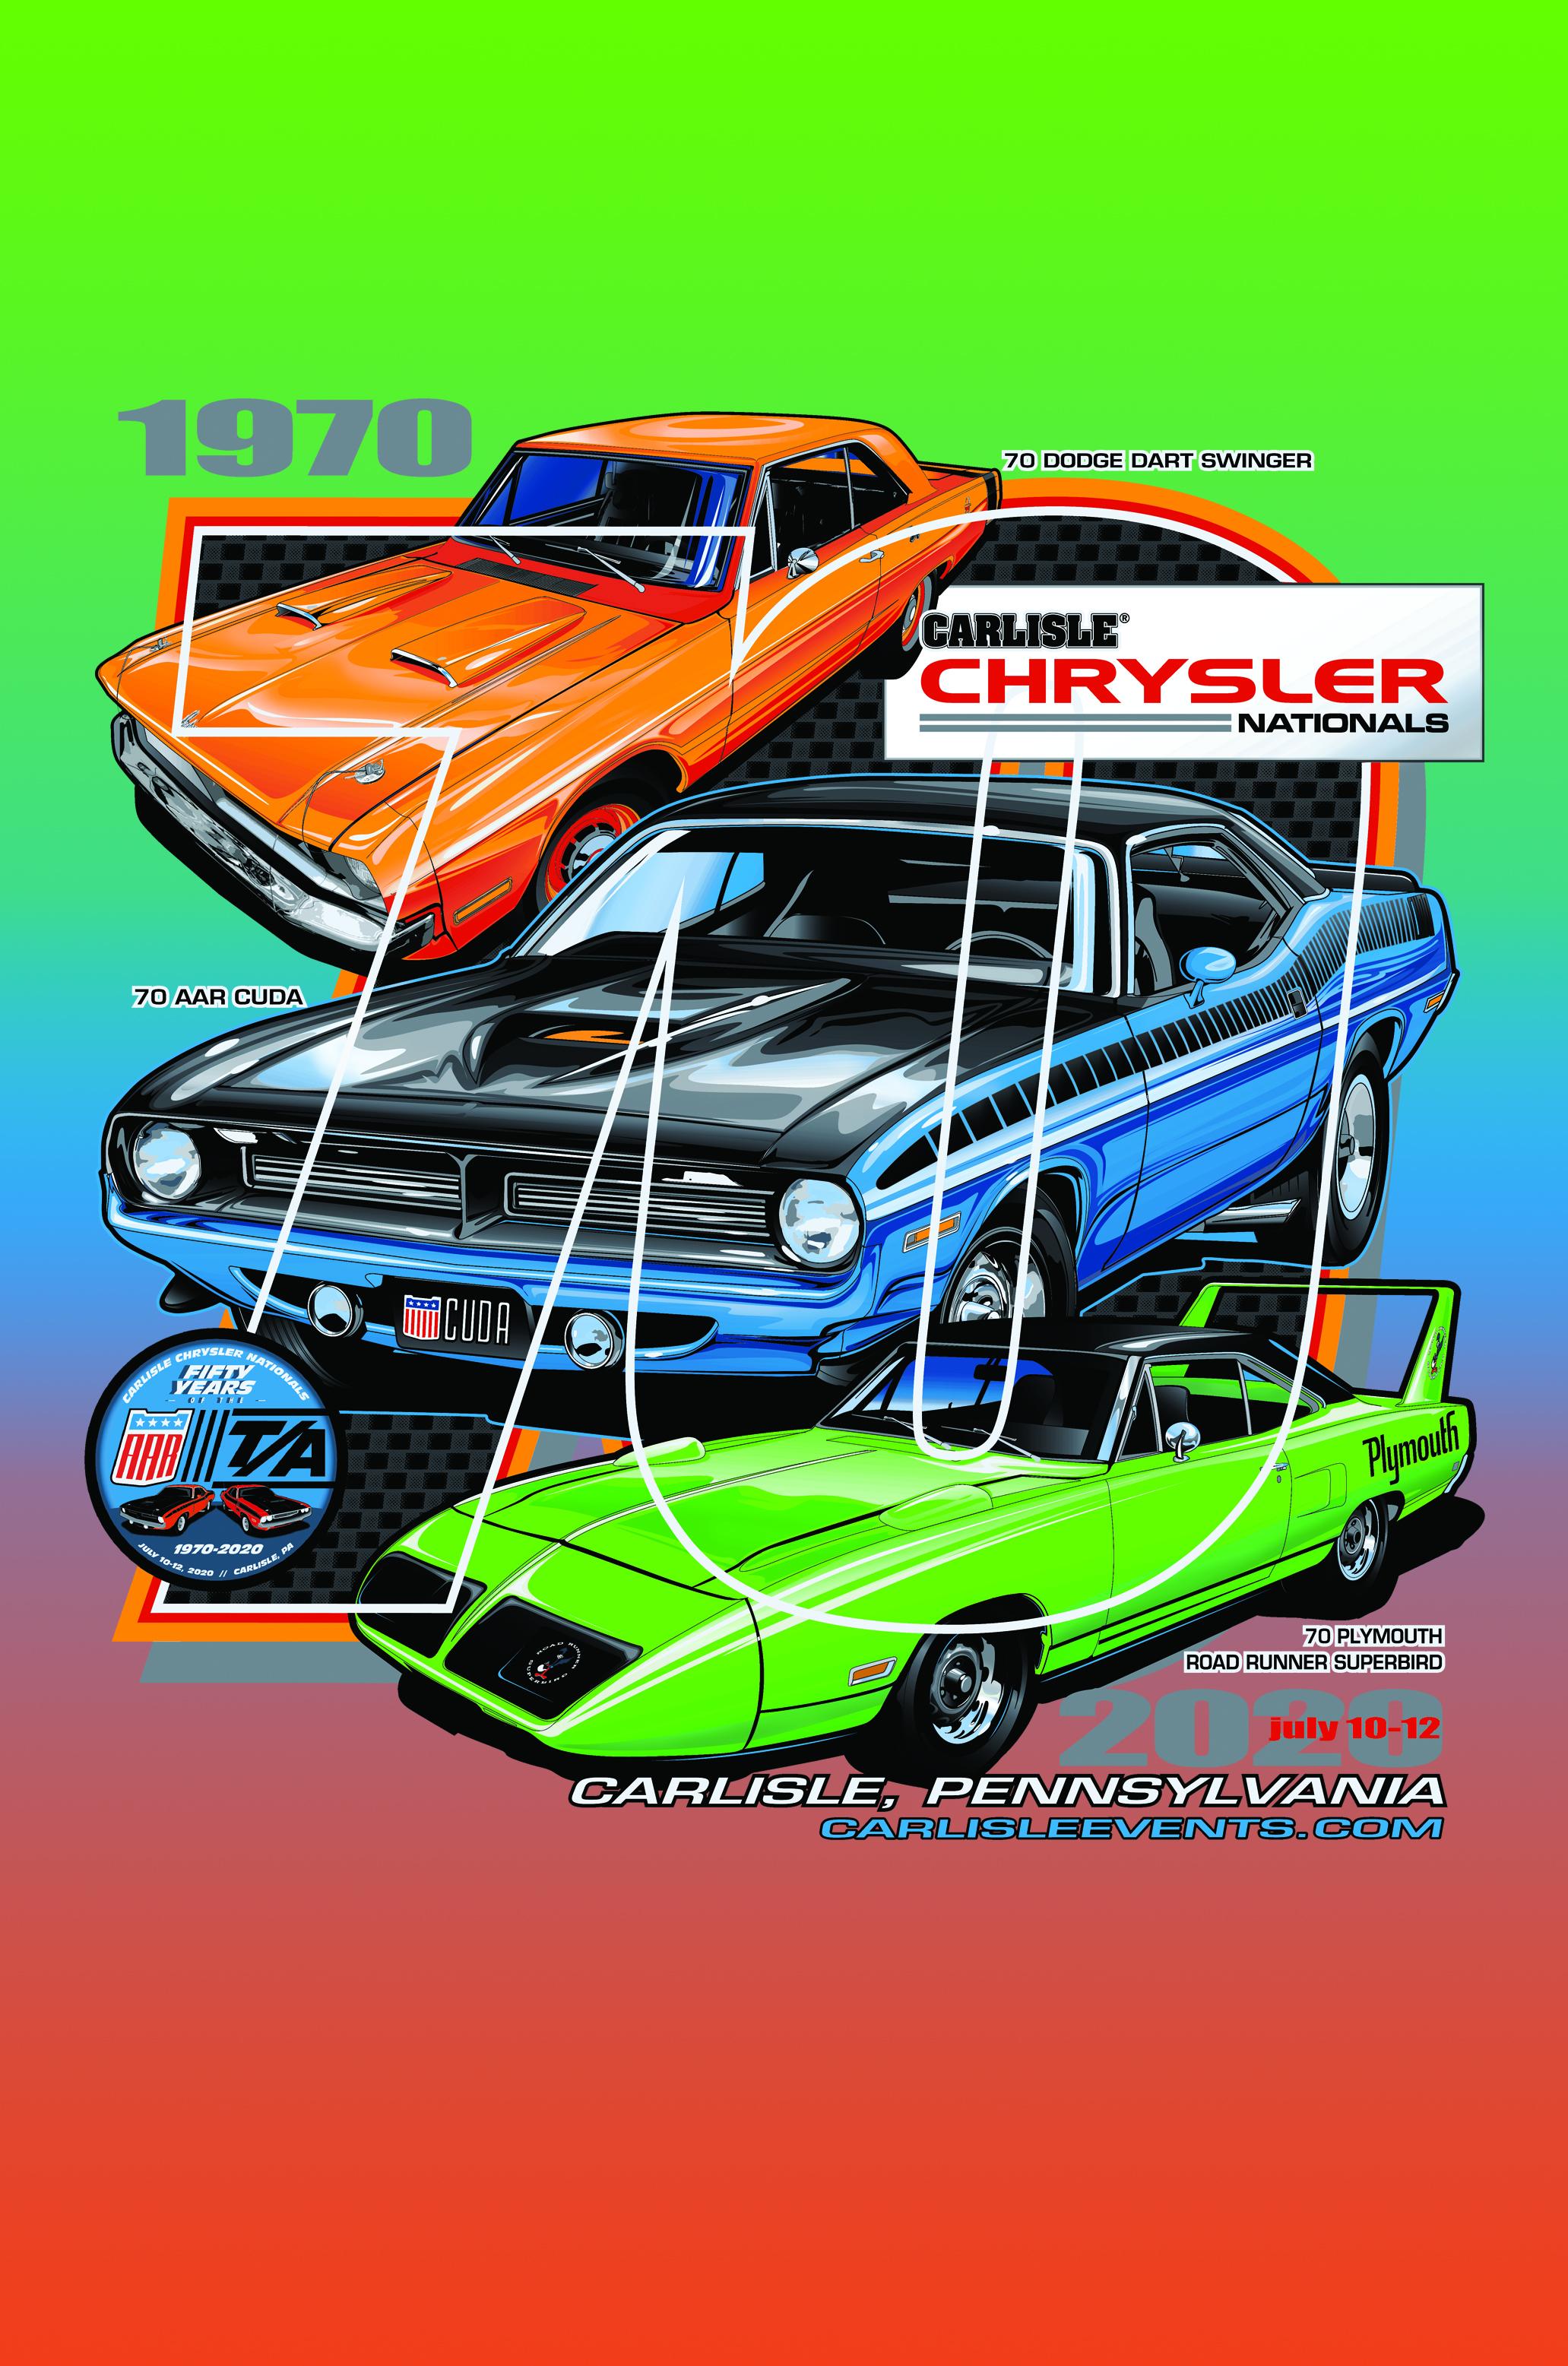 2020 Chrysler Nationals